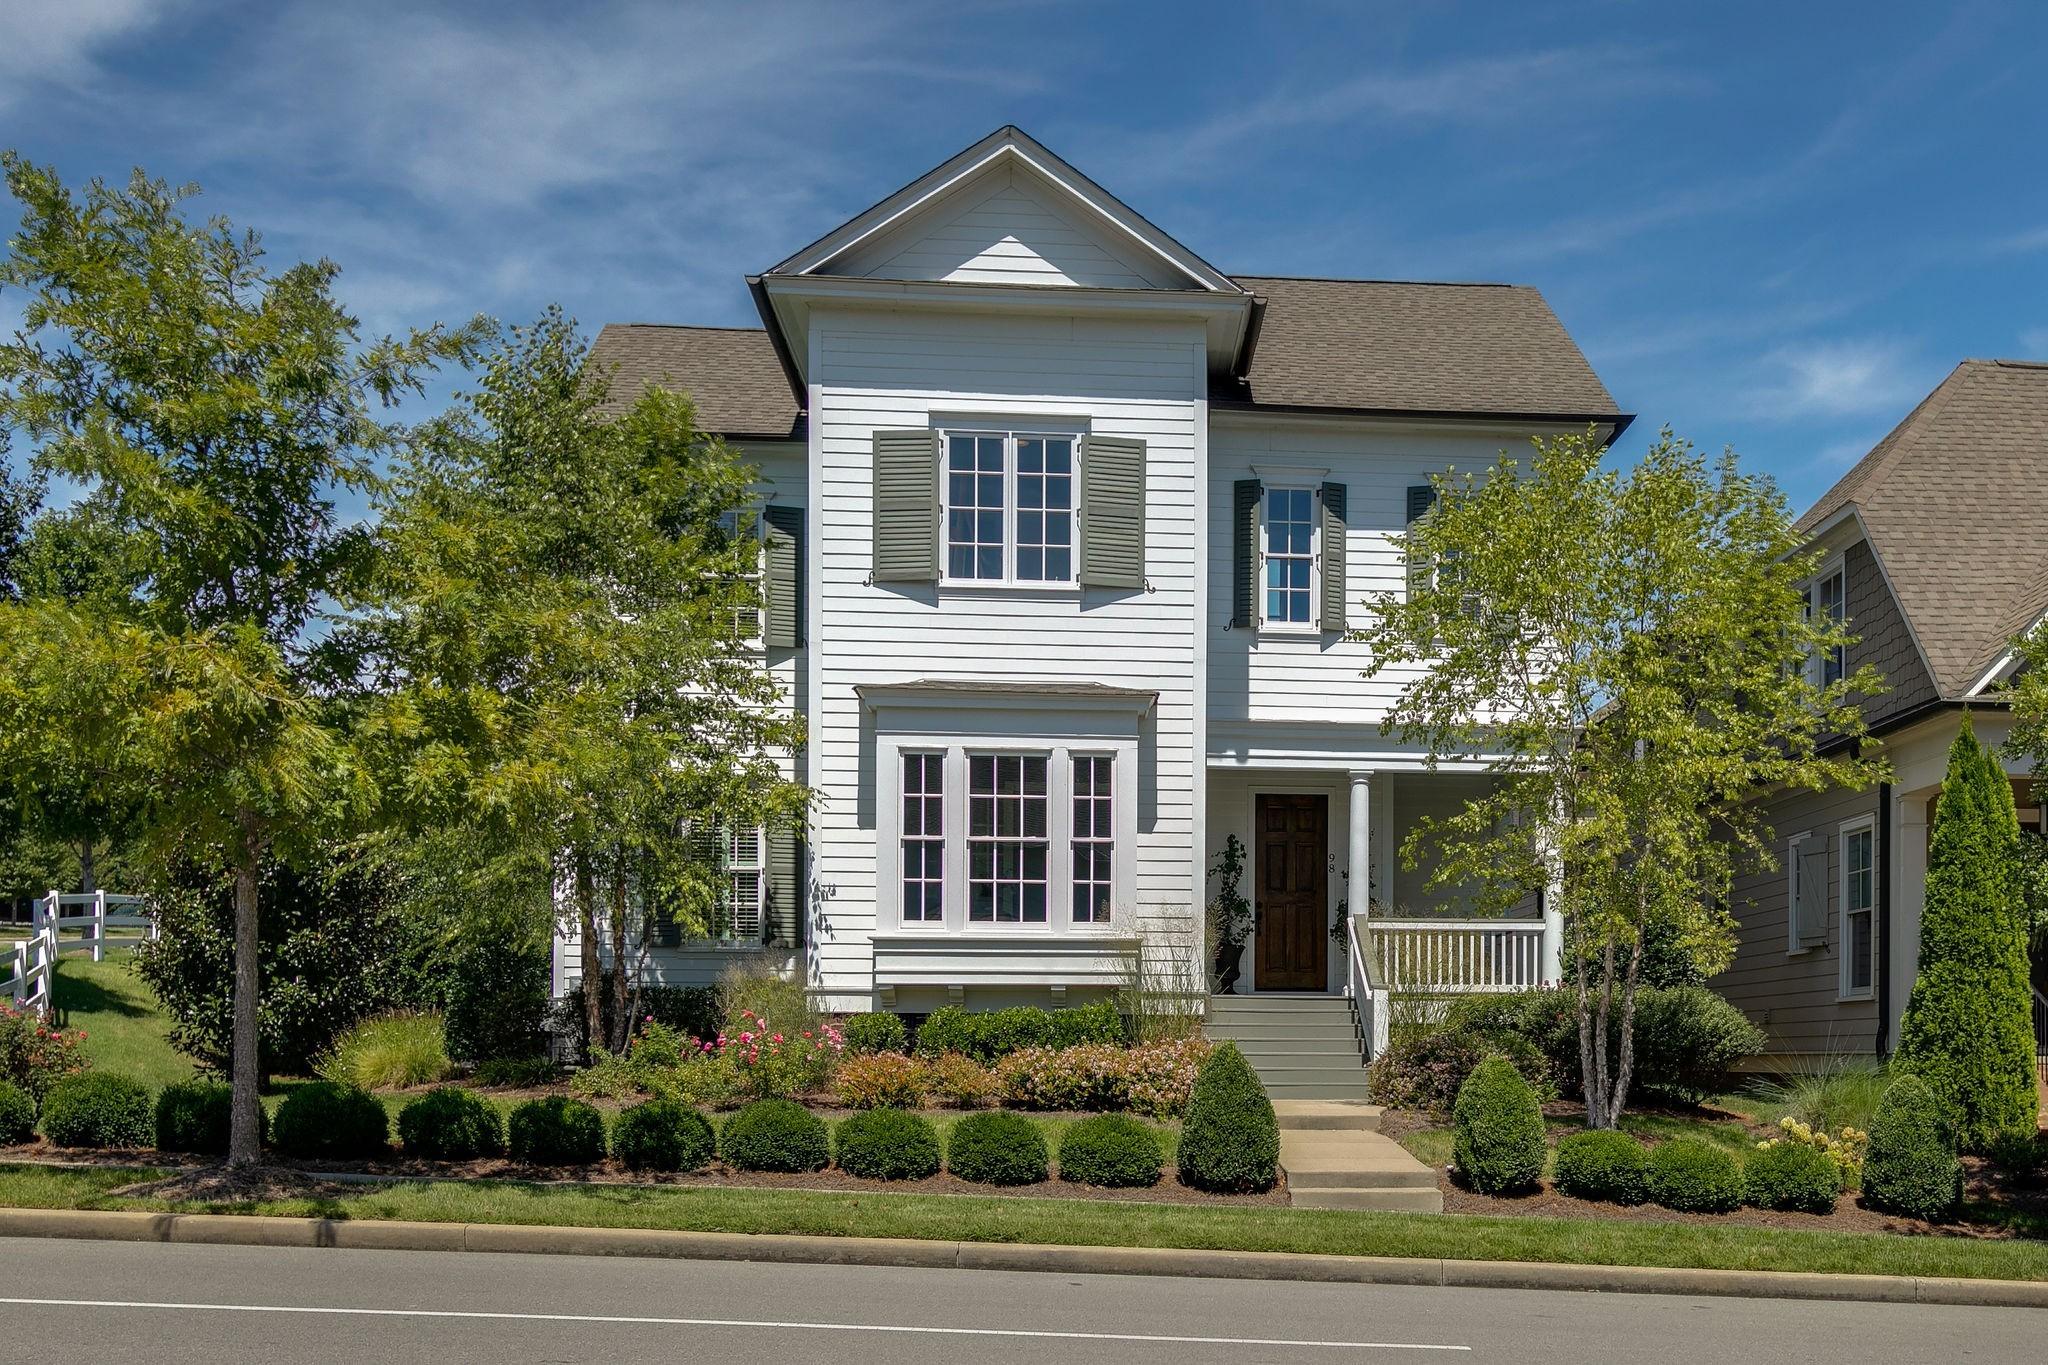 98 Poplar St Property Photo - Franklin, TN real estate listing